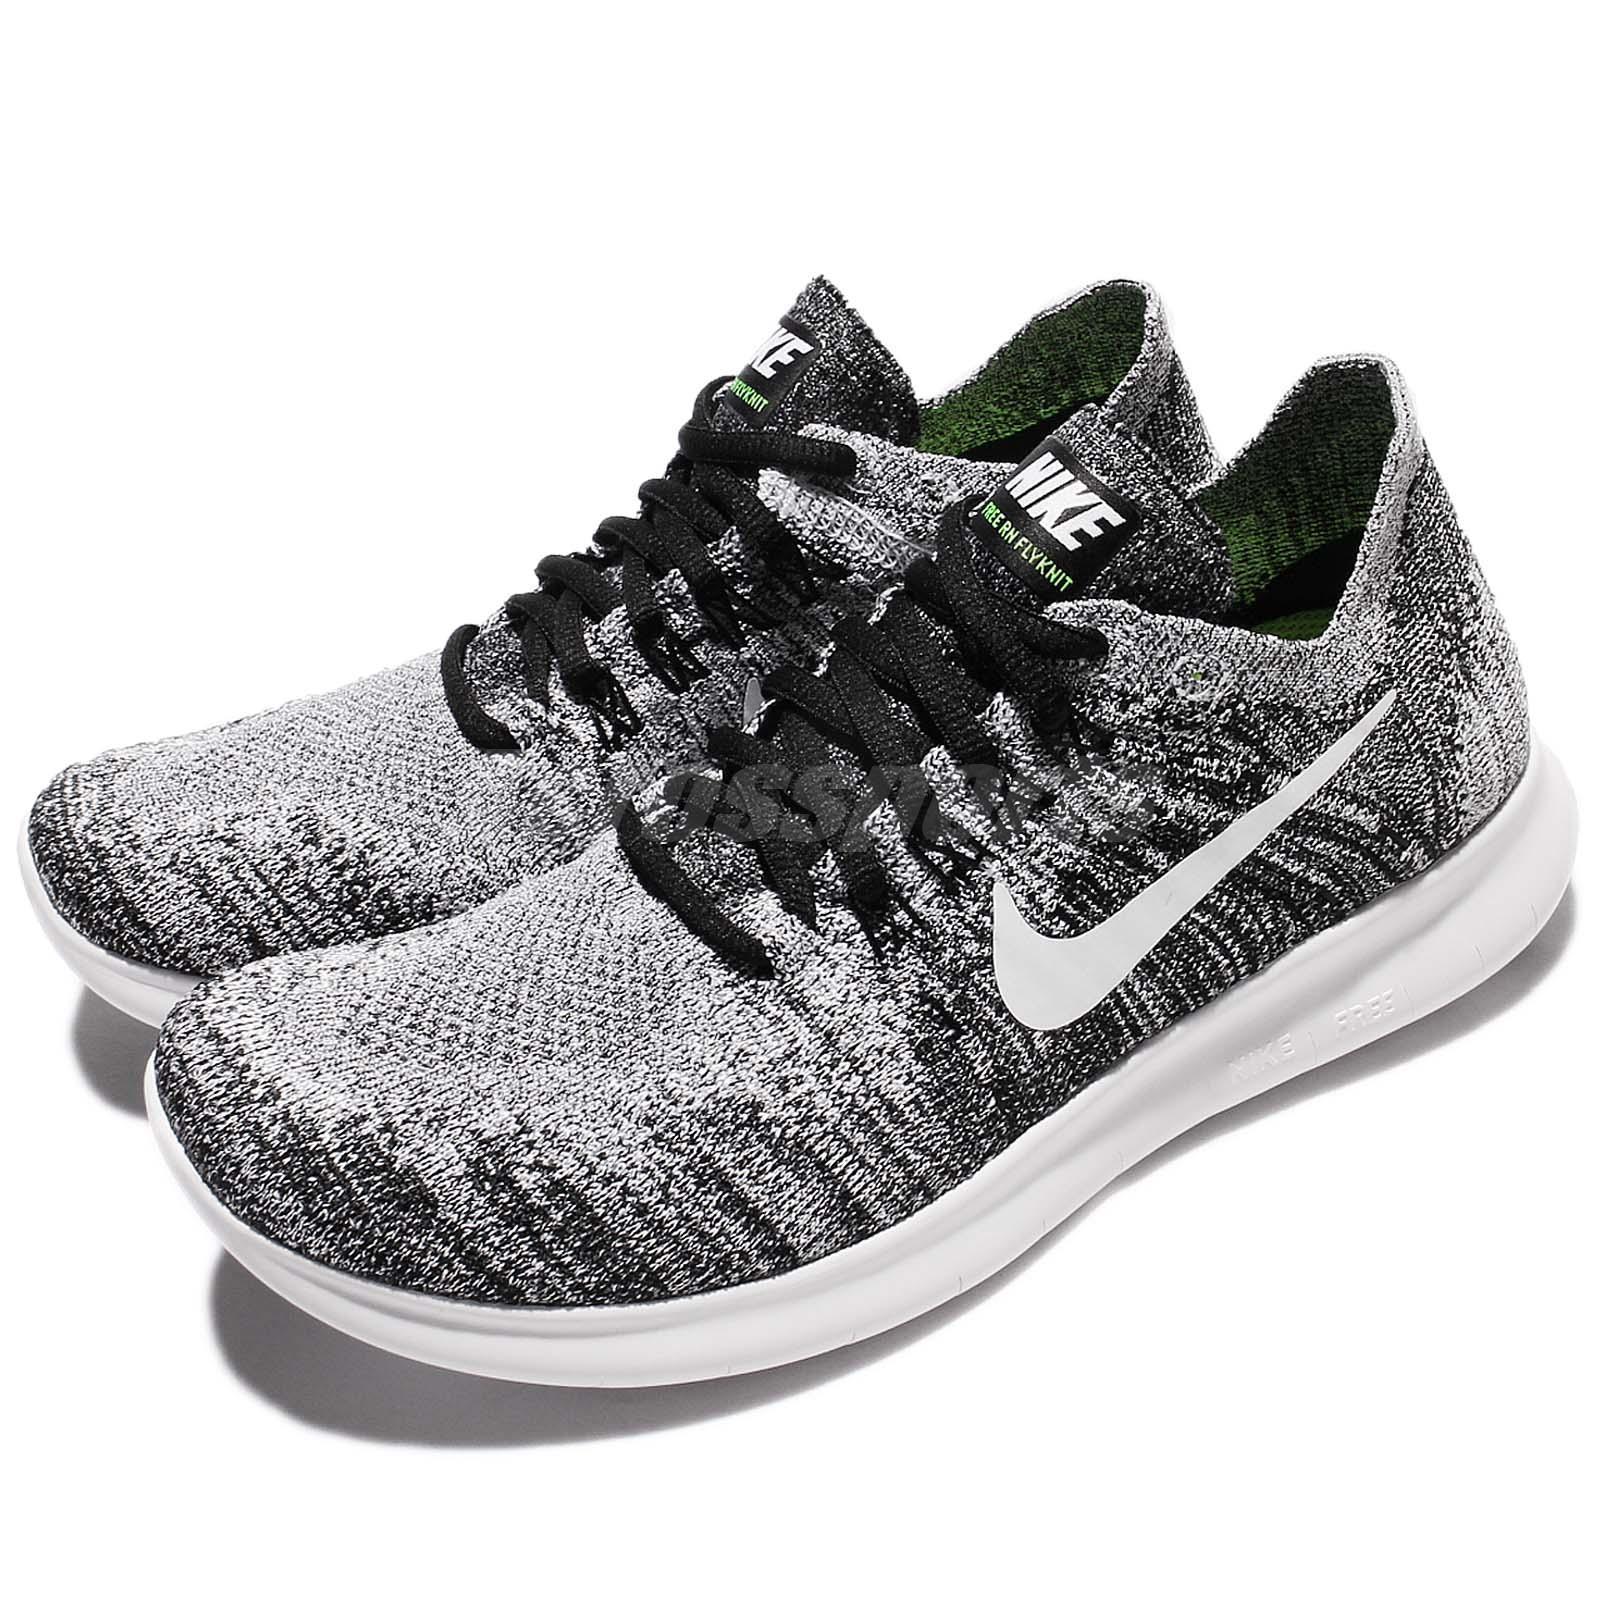 299283bf575 Details about Nike Wmns Free RN Flyknit 2017 White Black Women Running Shoe  Sneaker 880844-003